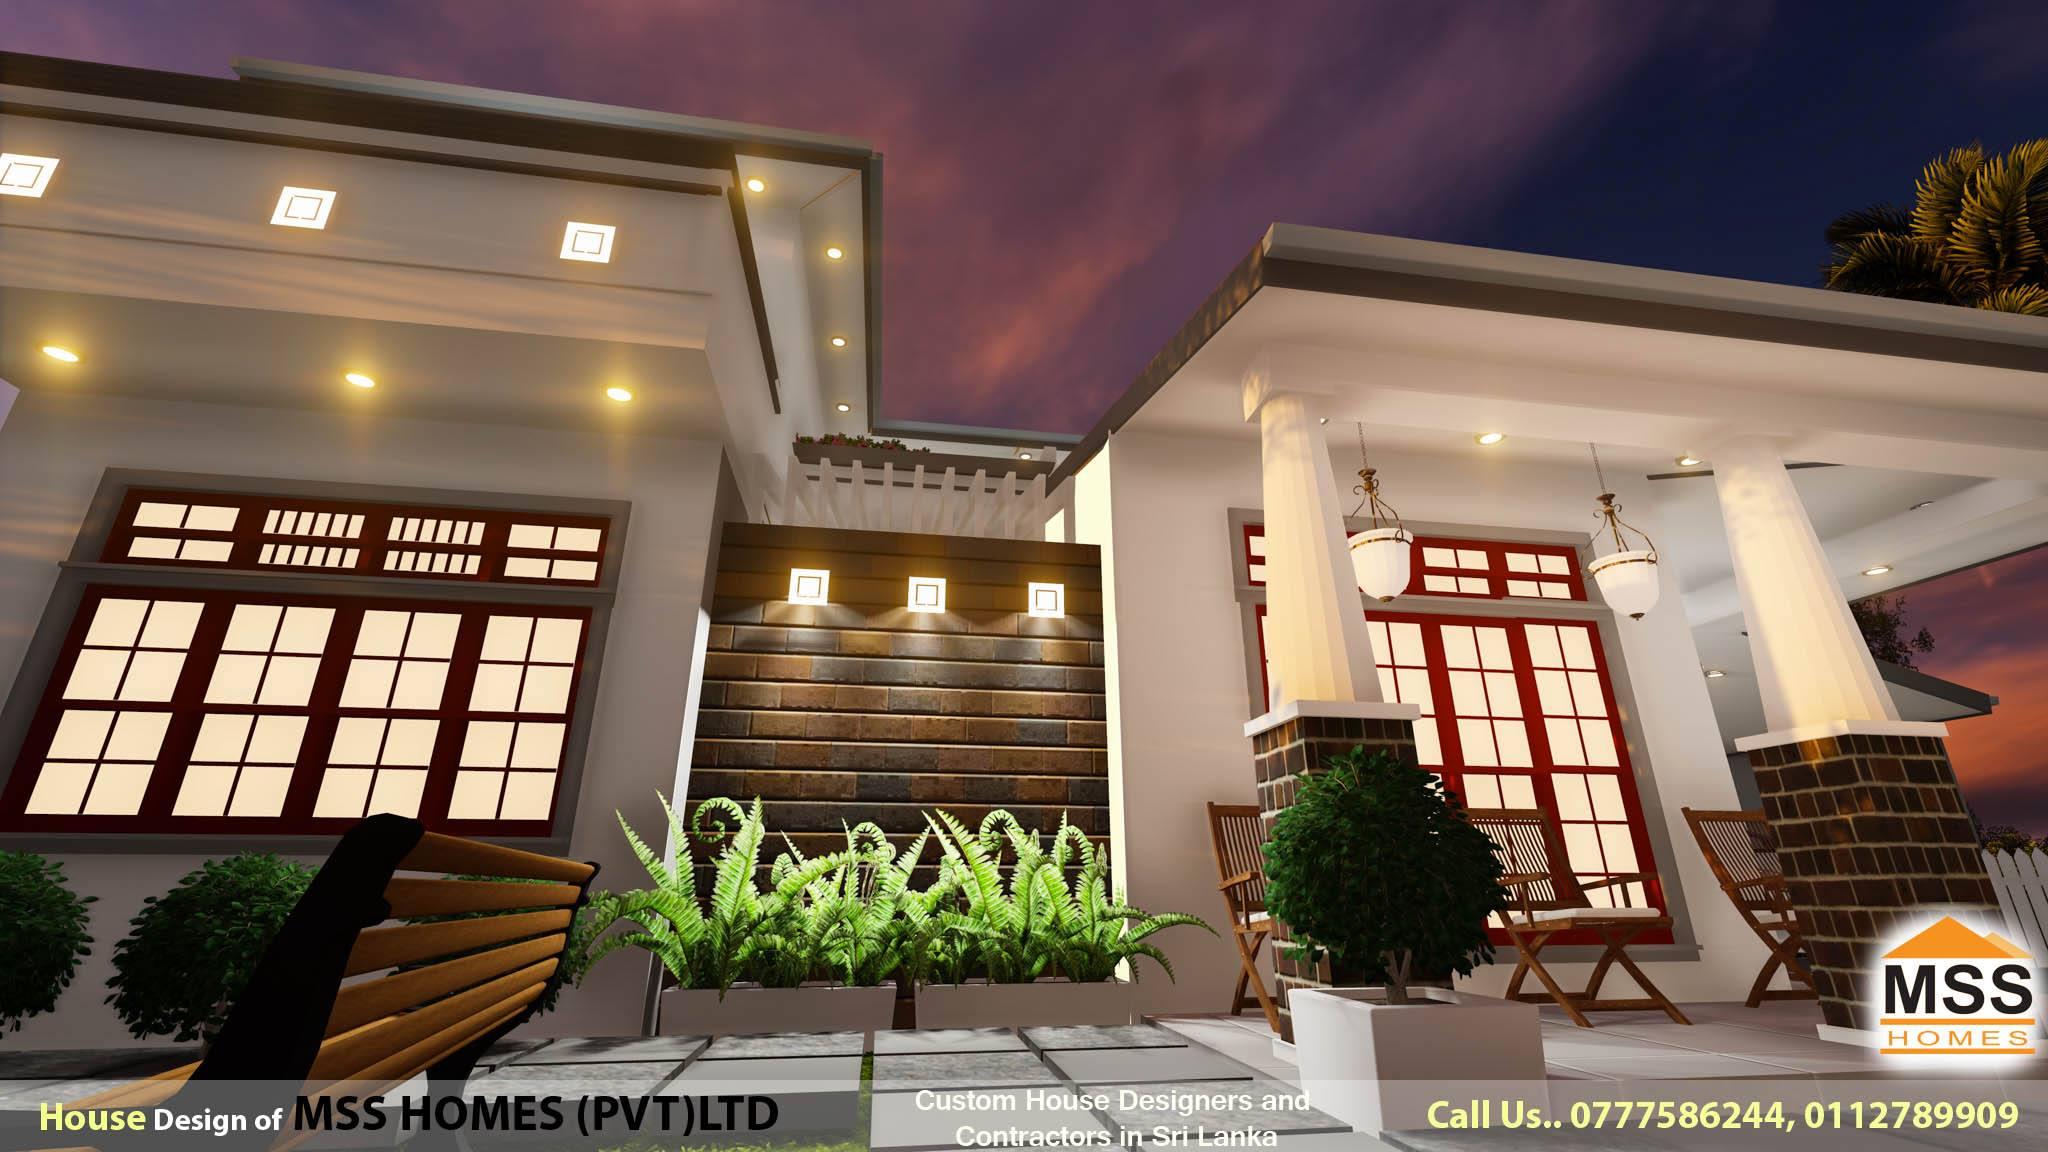 Enjoyable House Design Md514 House Builders In Sri Lanka Home Interior Design Ideas Helimdqseriescom